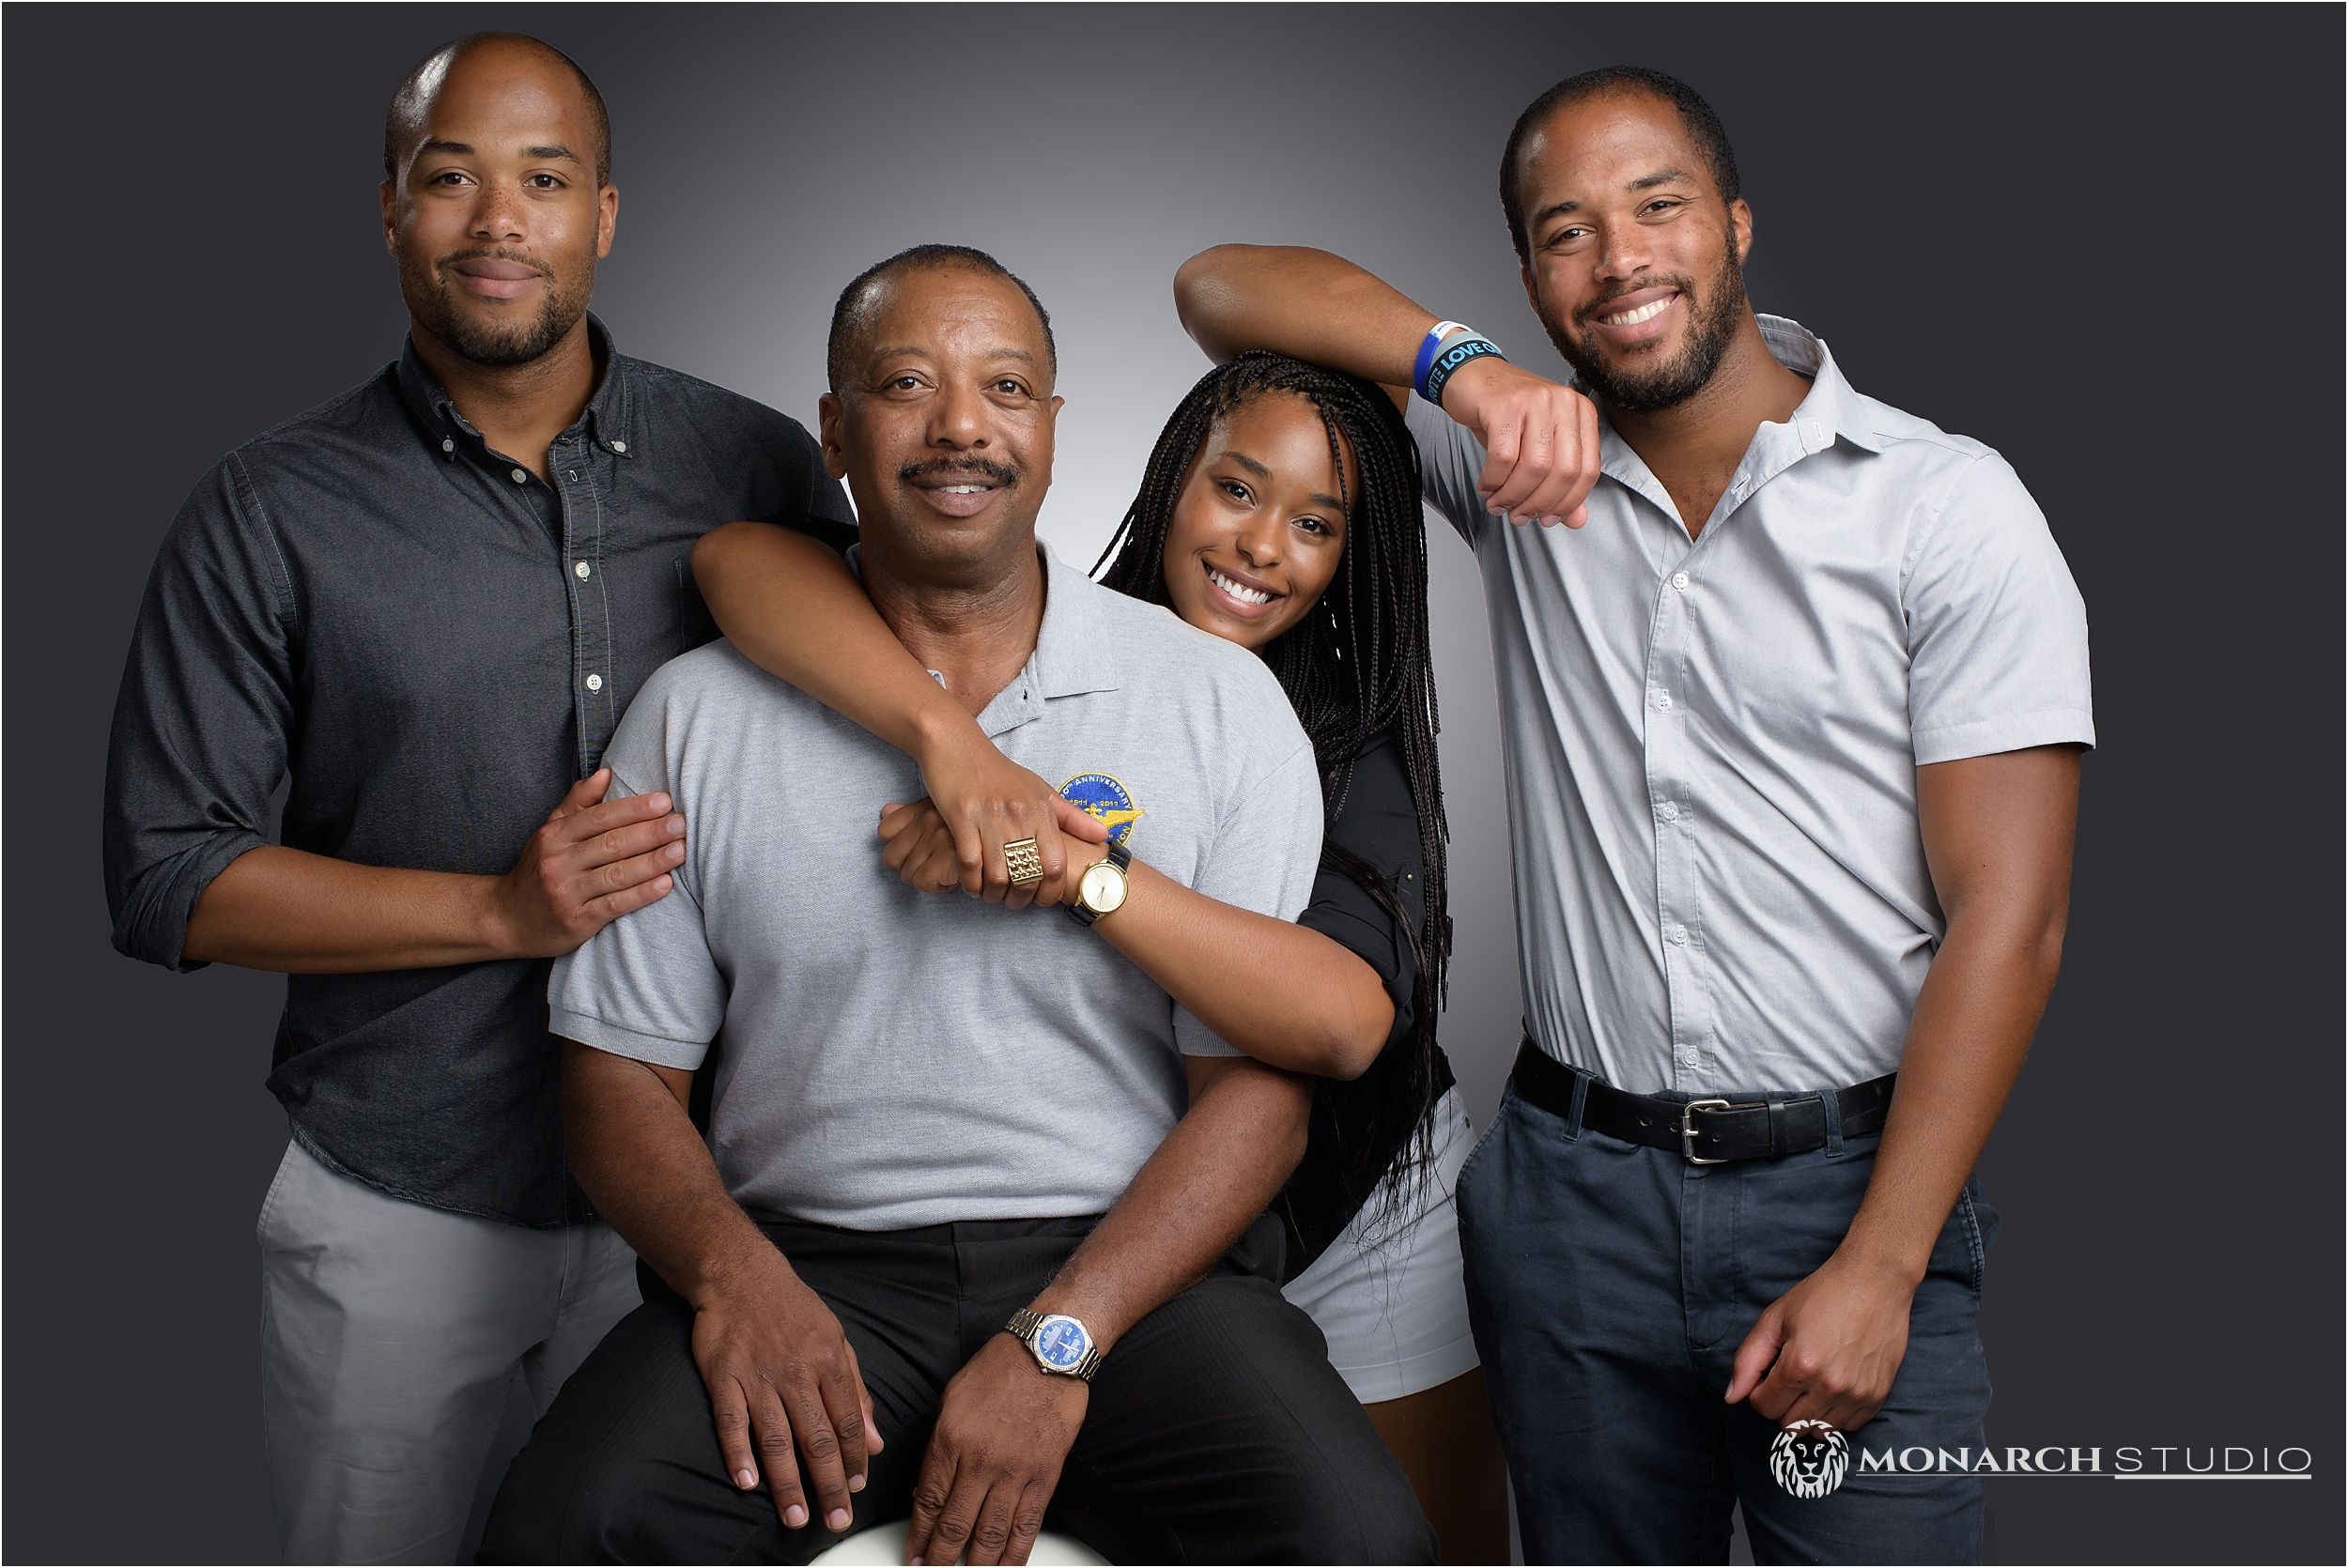 st-augustine-photographer-family-reunion-portrait-009.jpg